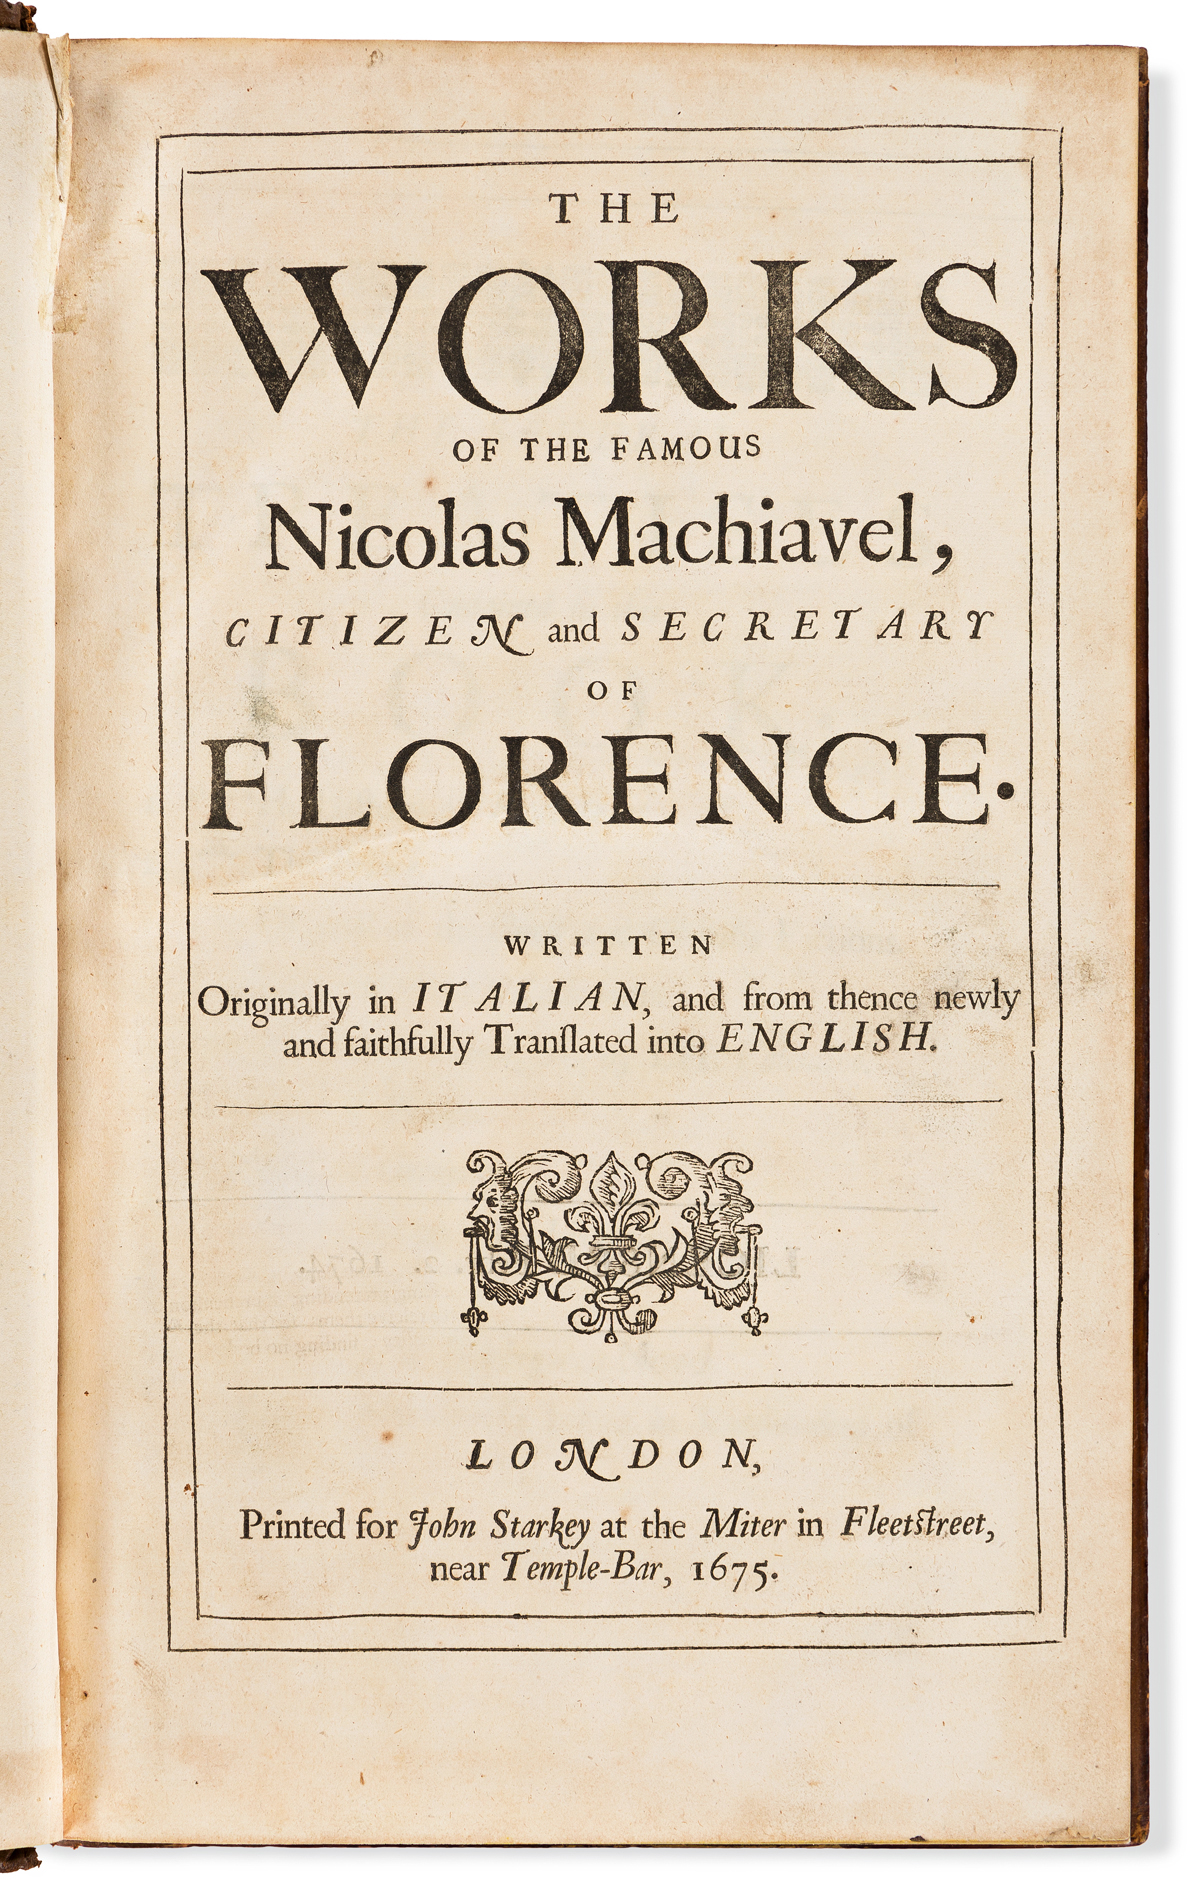 Machiavelli, Niccolò (1469-1527) The Works.